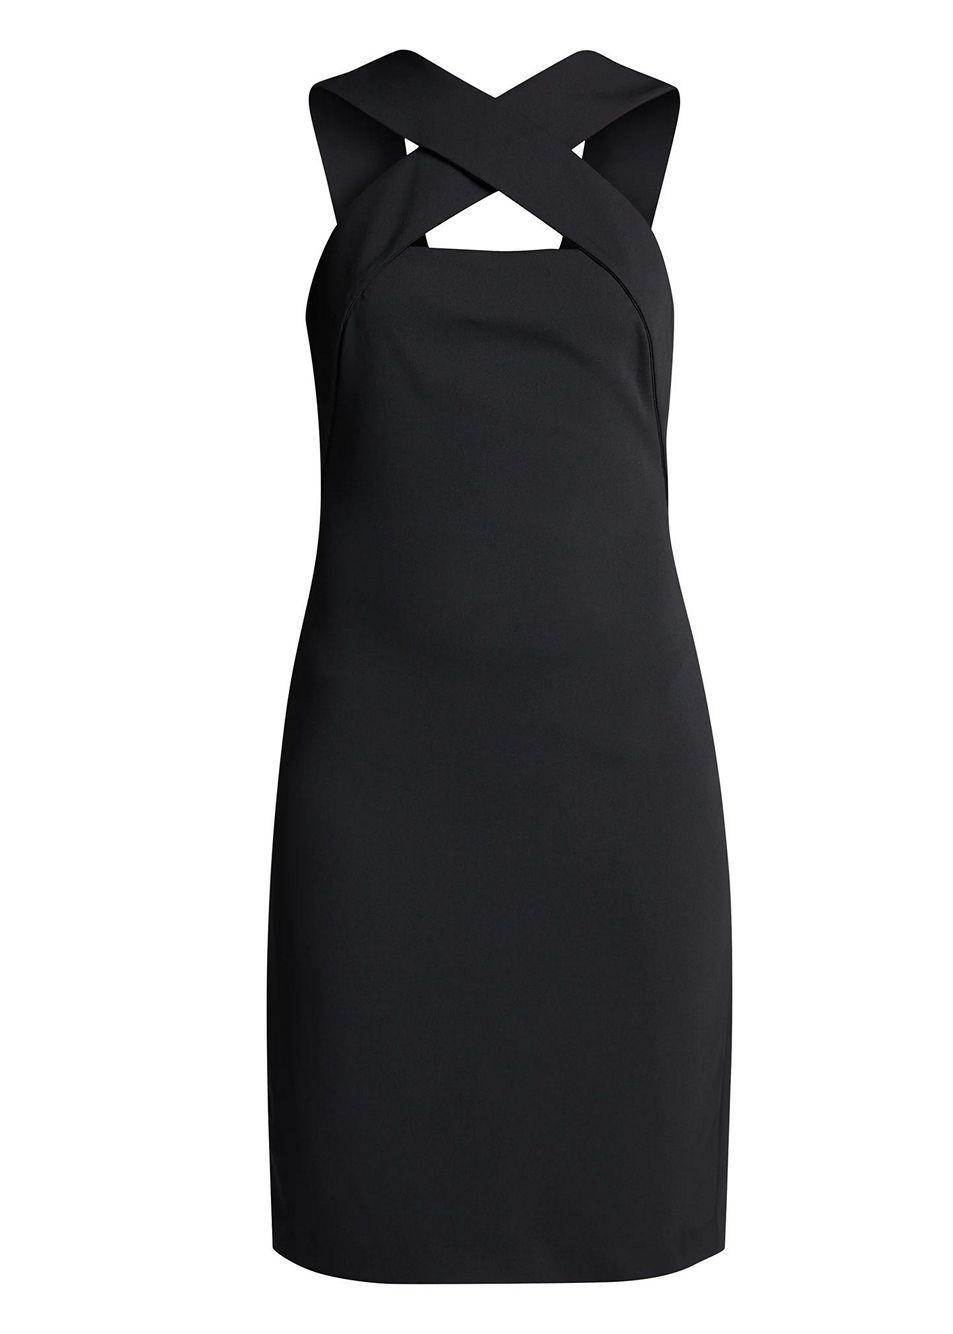 Andie Stretch Crepe Dress Item # 1015030